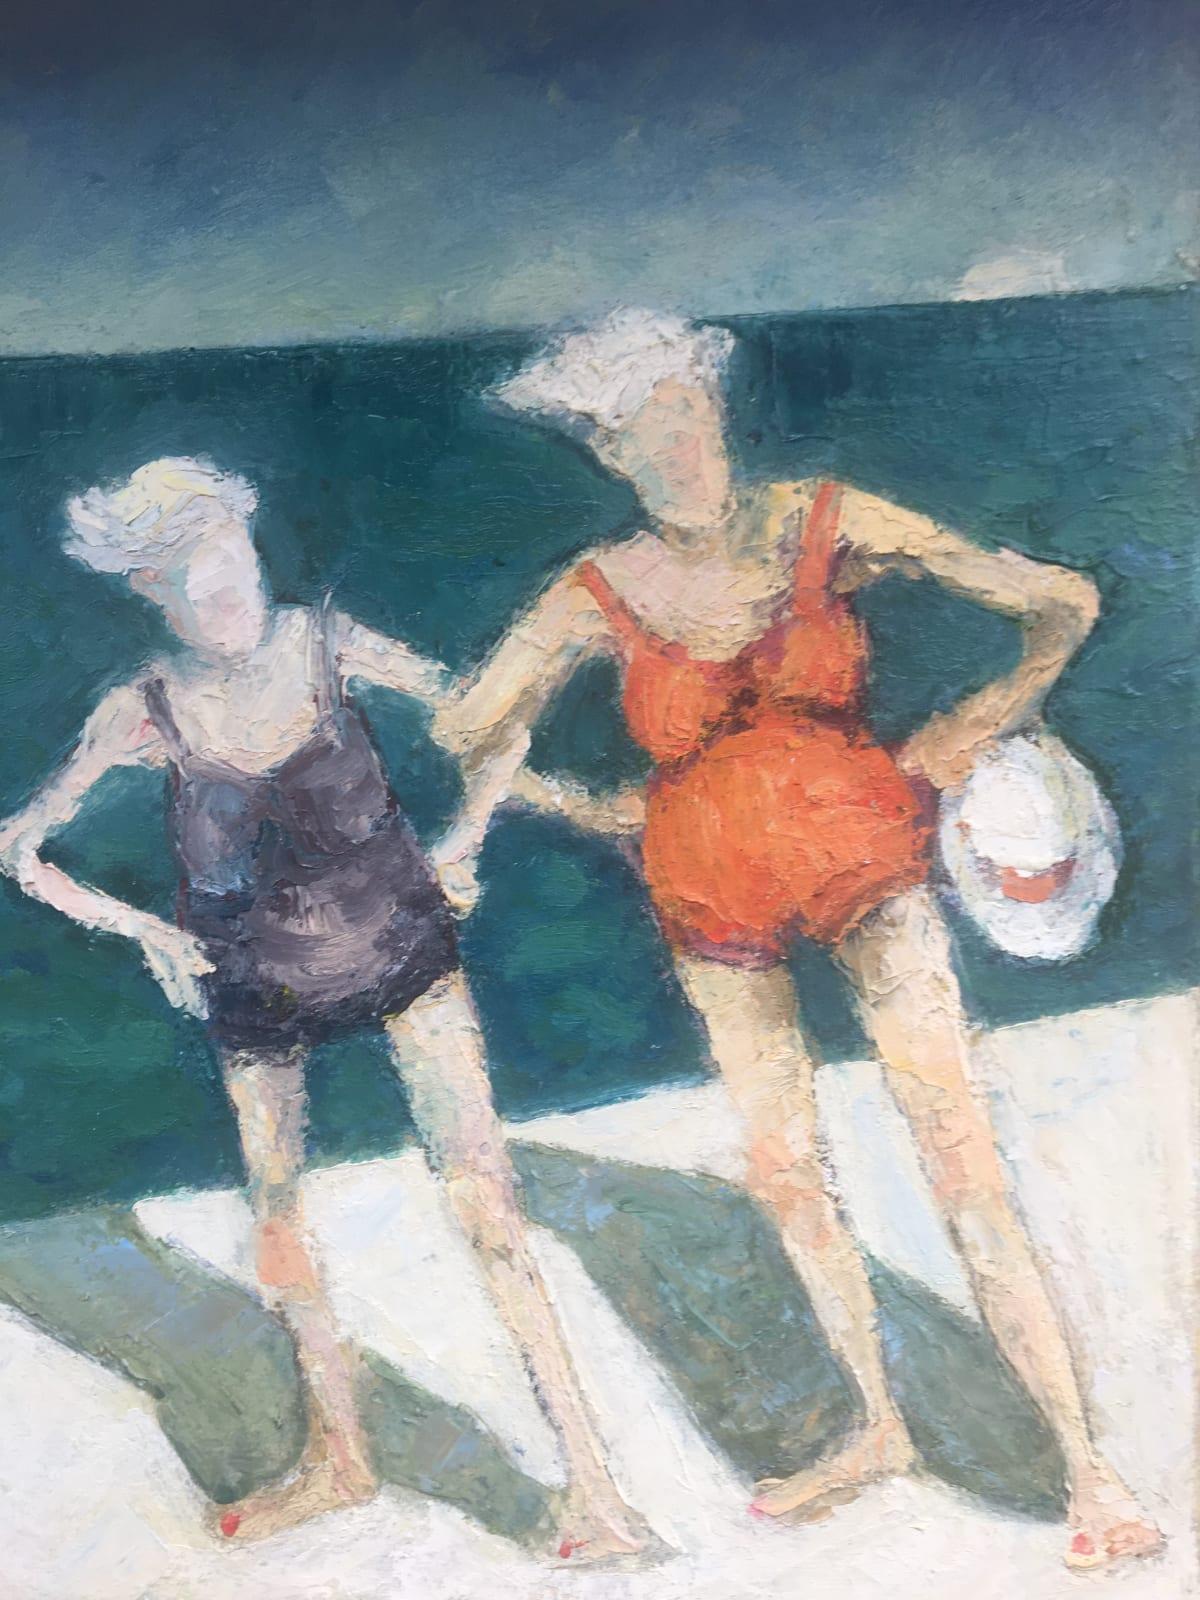 Carolyn King, Jolly Cruising, 2020